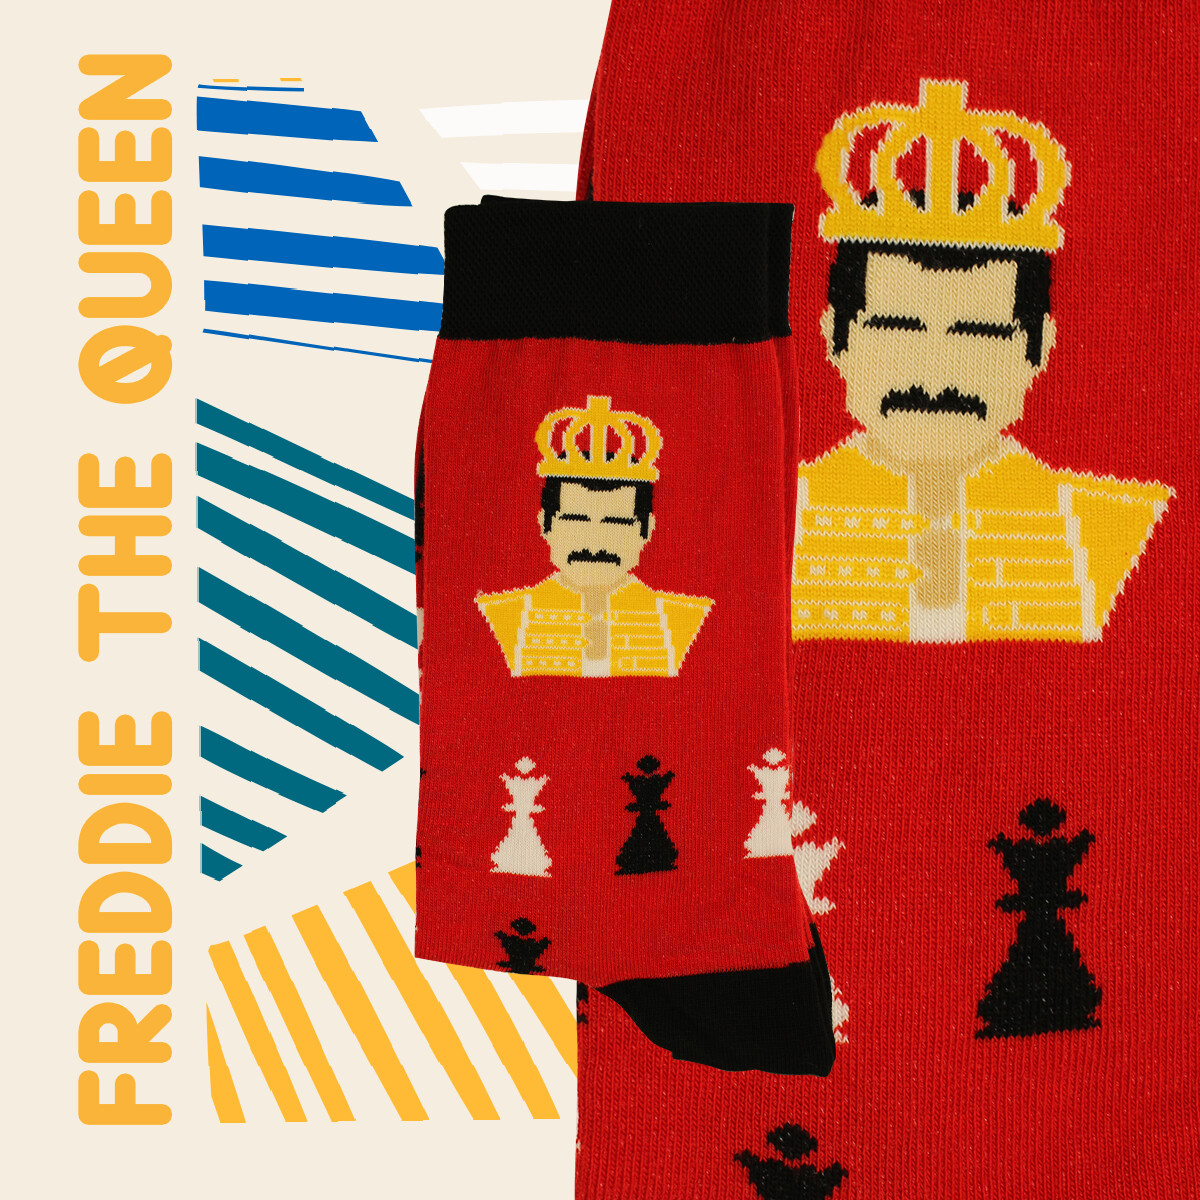 Freddie Mercury-ის წინდები